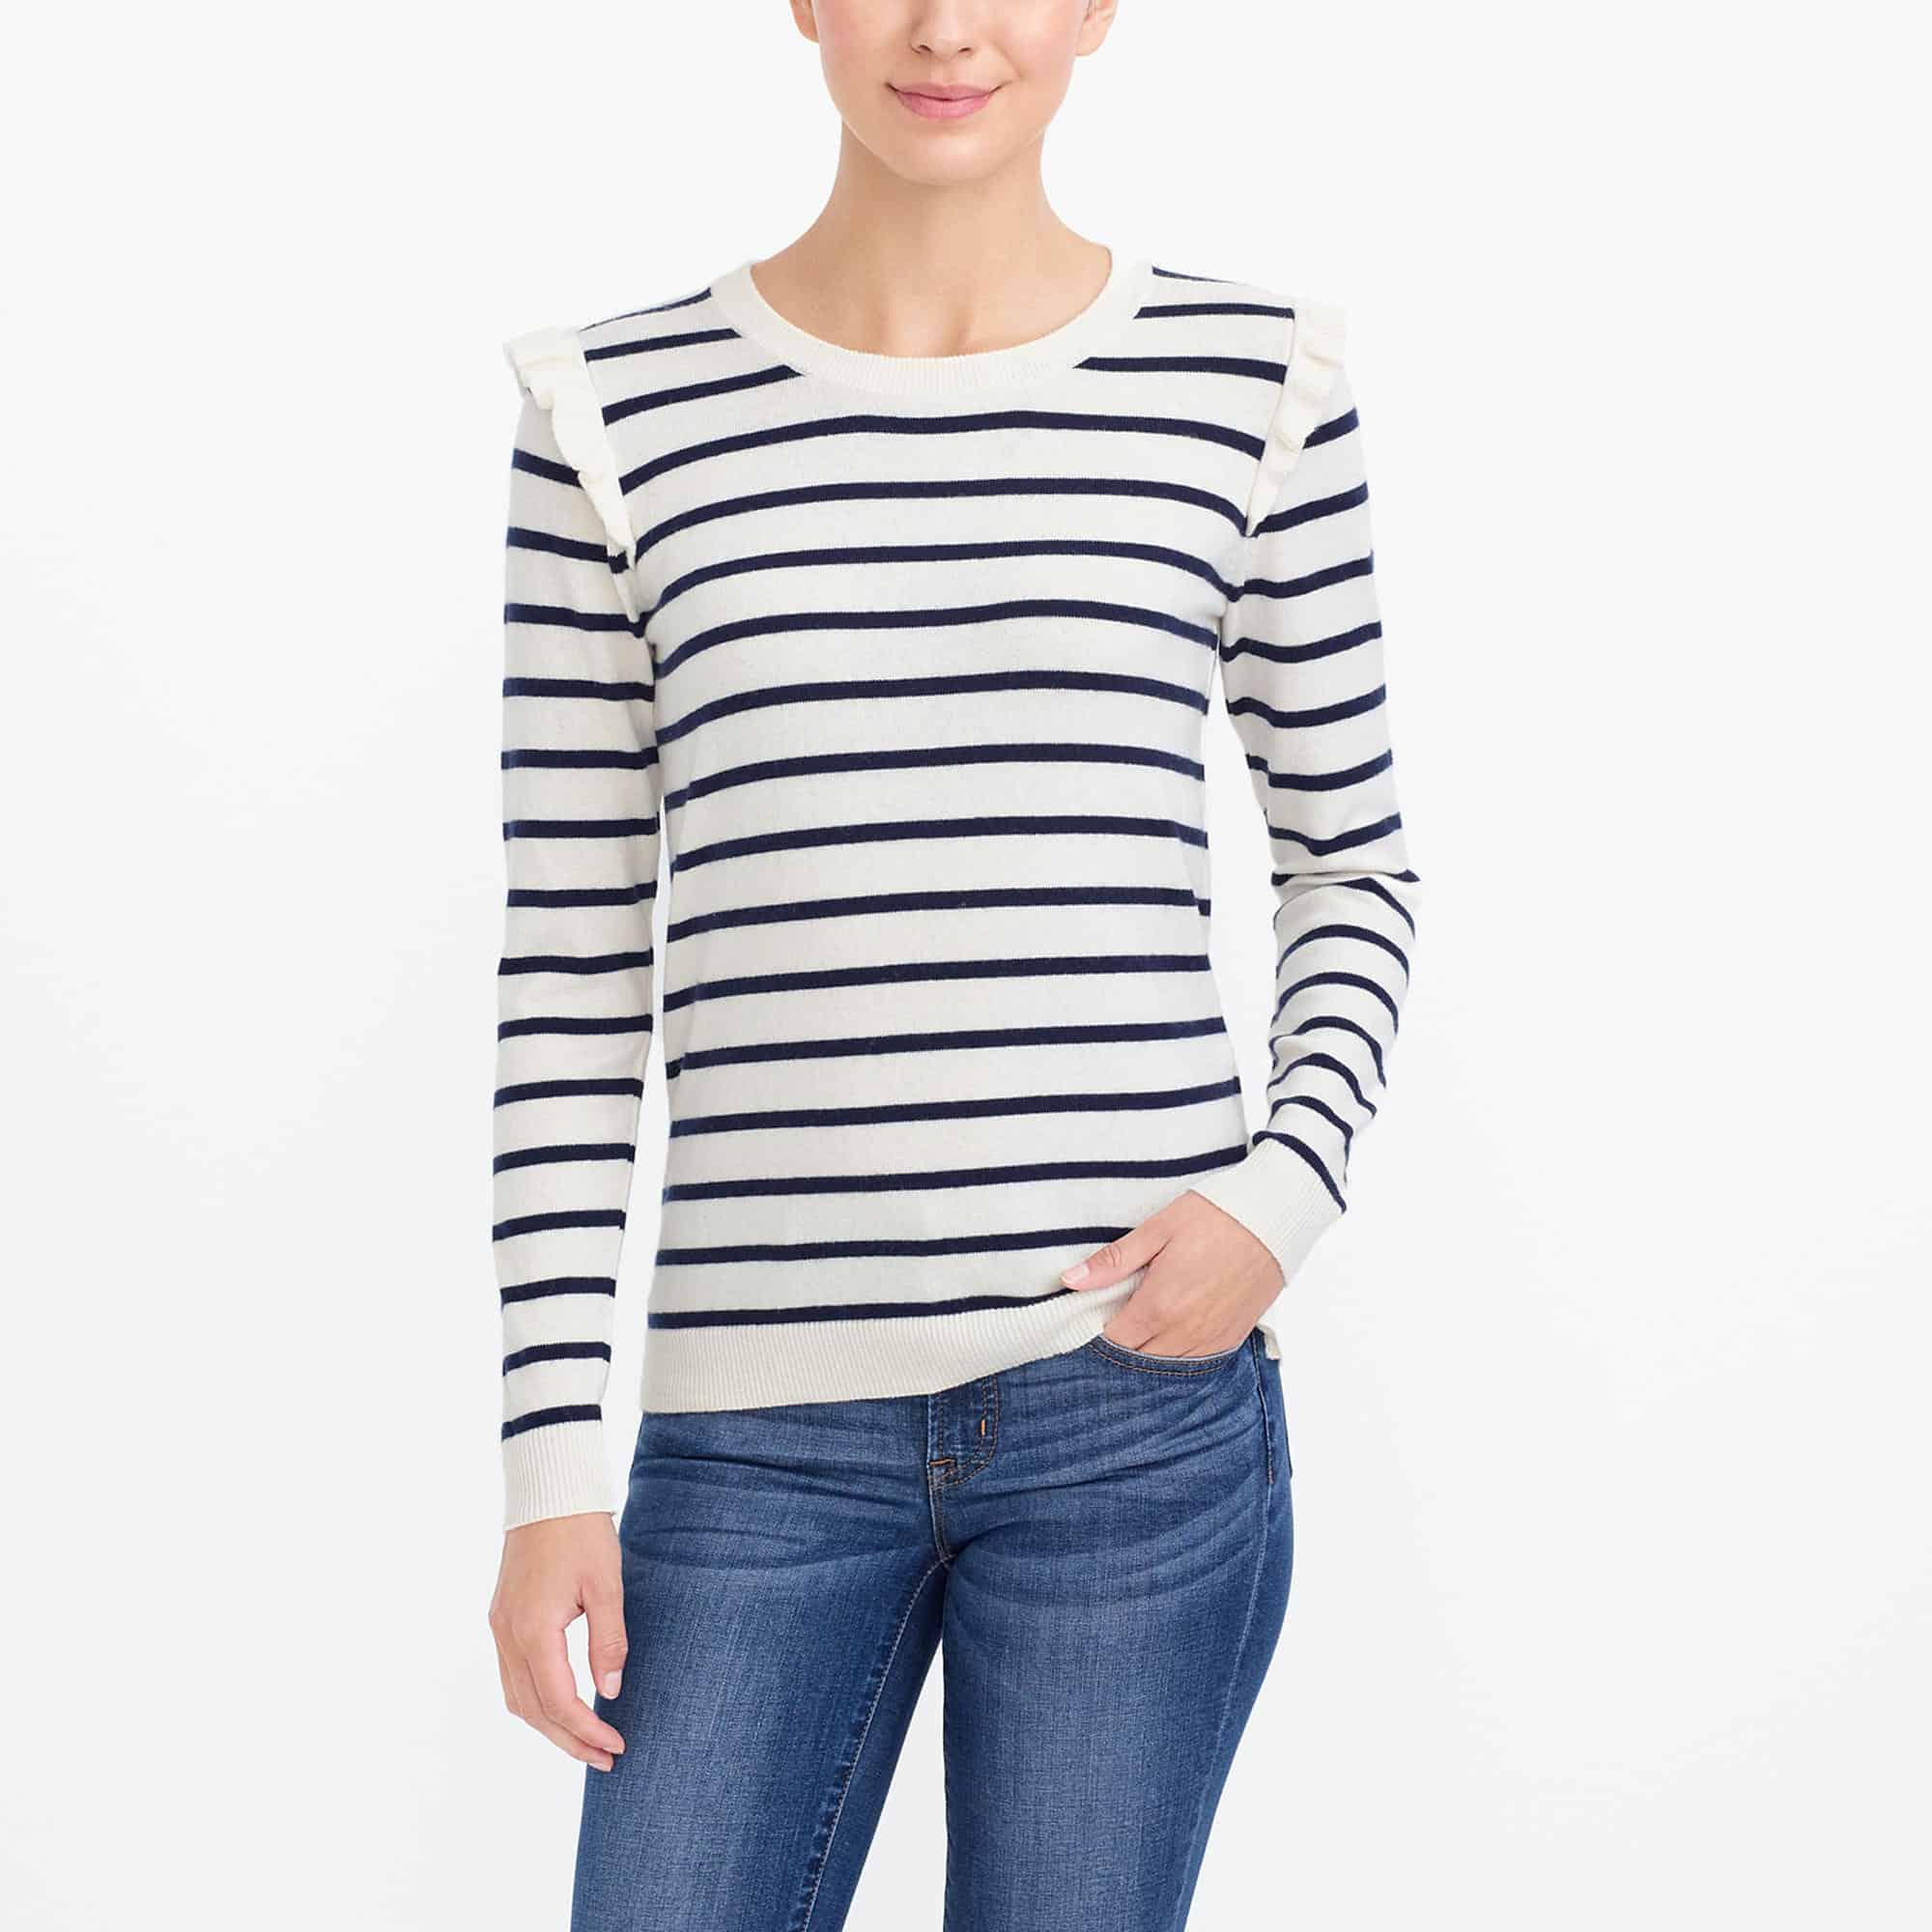 Super cute striped sweater -- perfect for Fall!